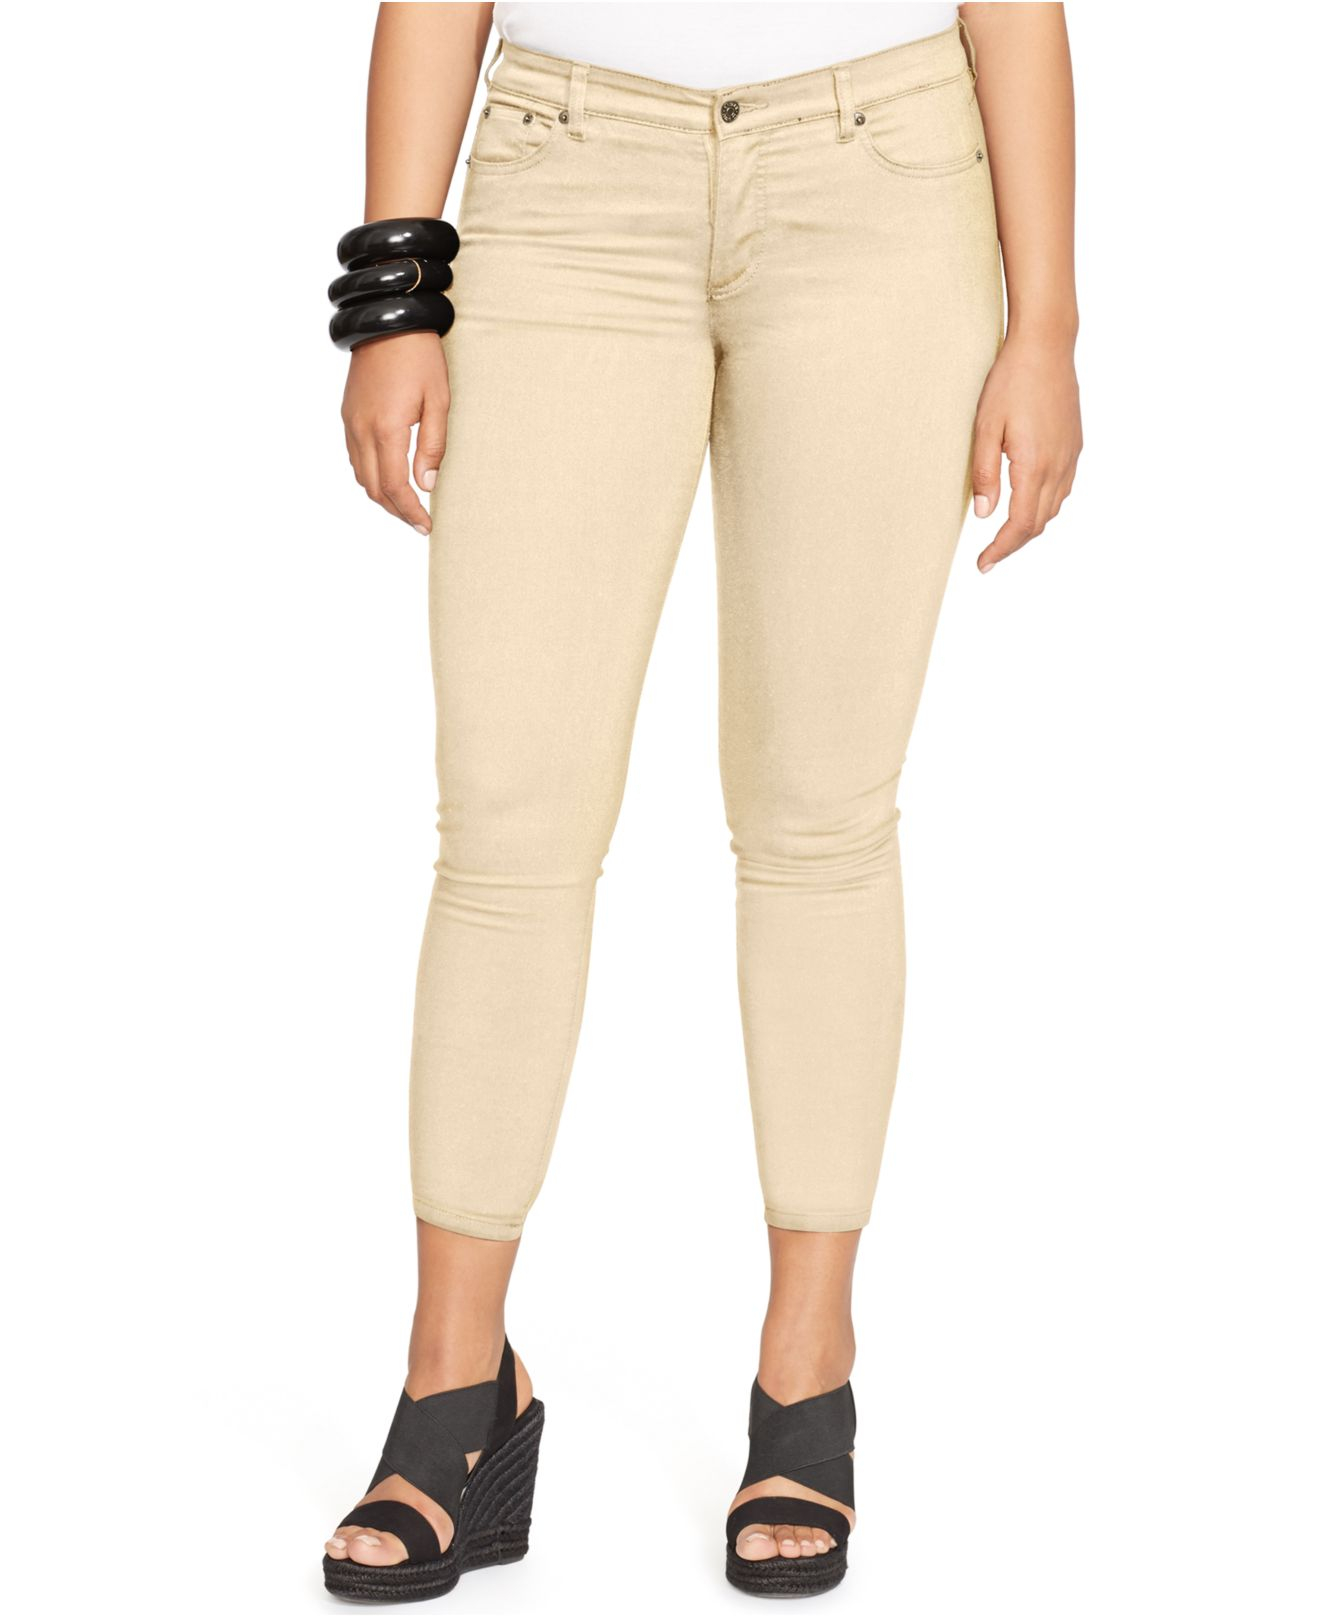 60c9921fa1a46 Lauren by Ralph Lauren - Natural Plus Size Cropped Straight-Leg Jeans - Lyst